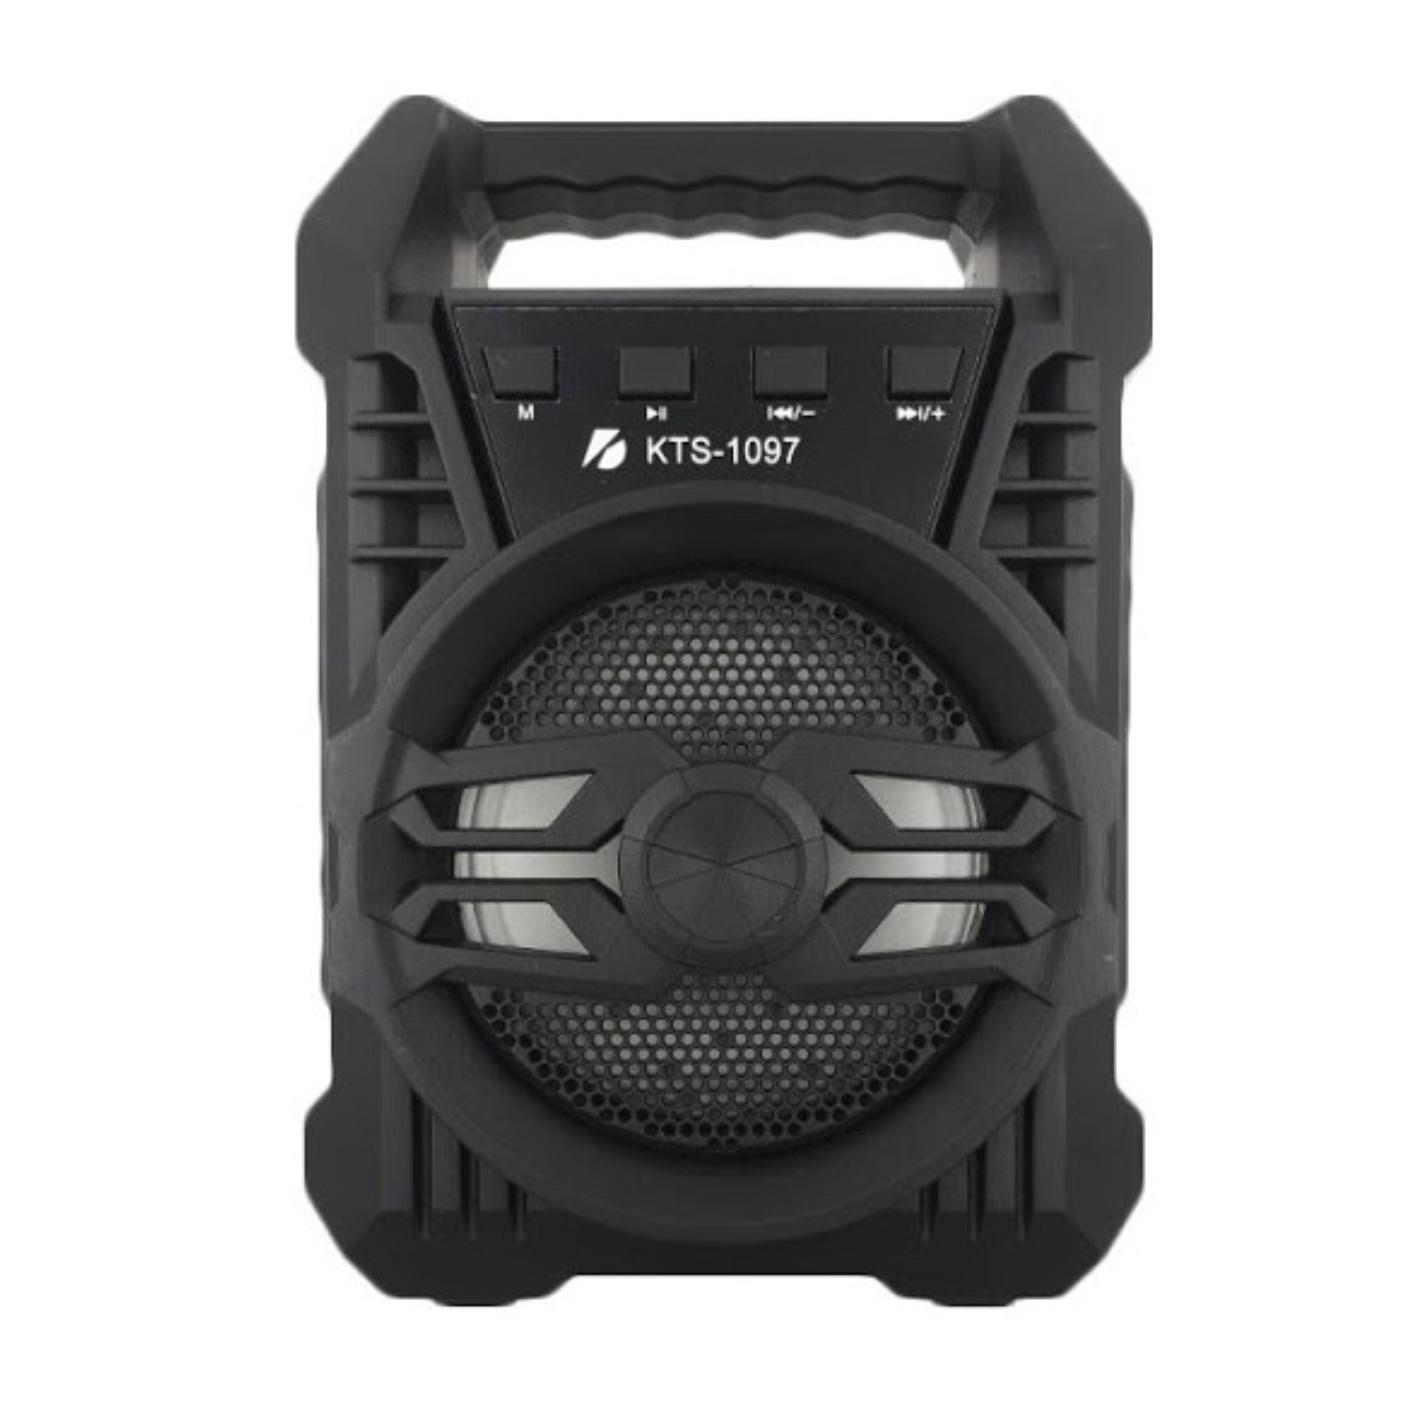 Boxa Bluetooth KTS-1097 cu radio FM + Microfon Karaoke